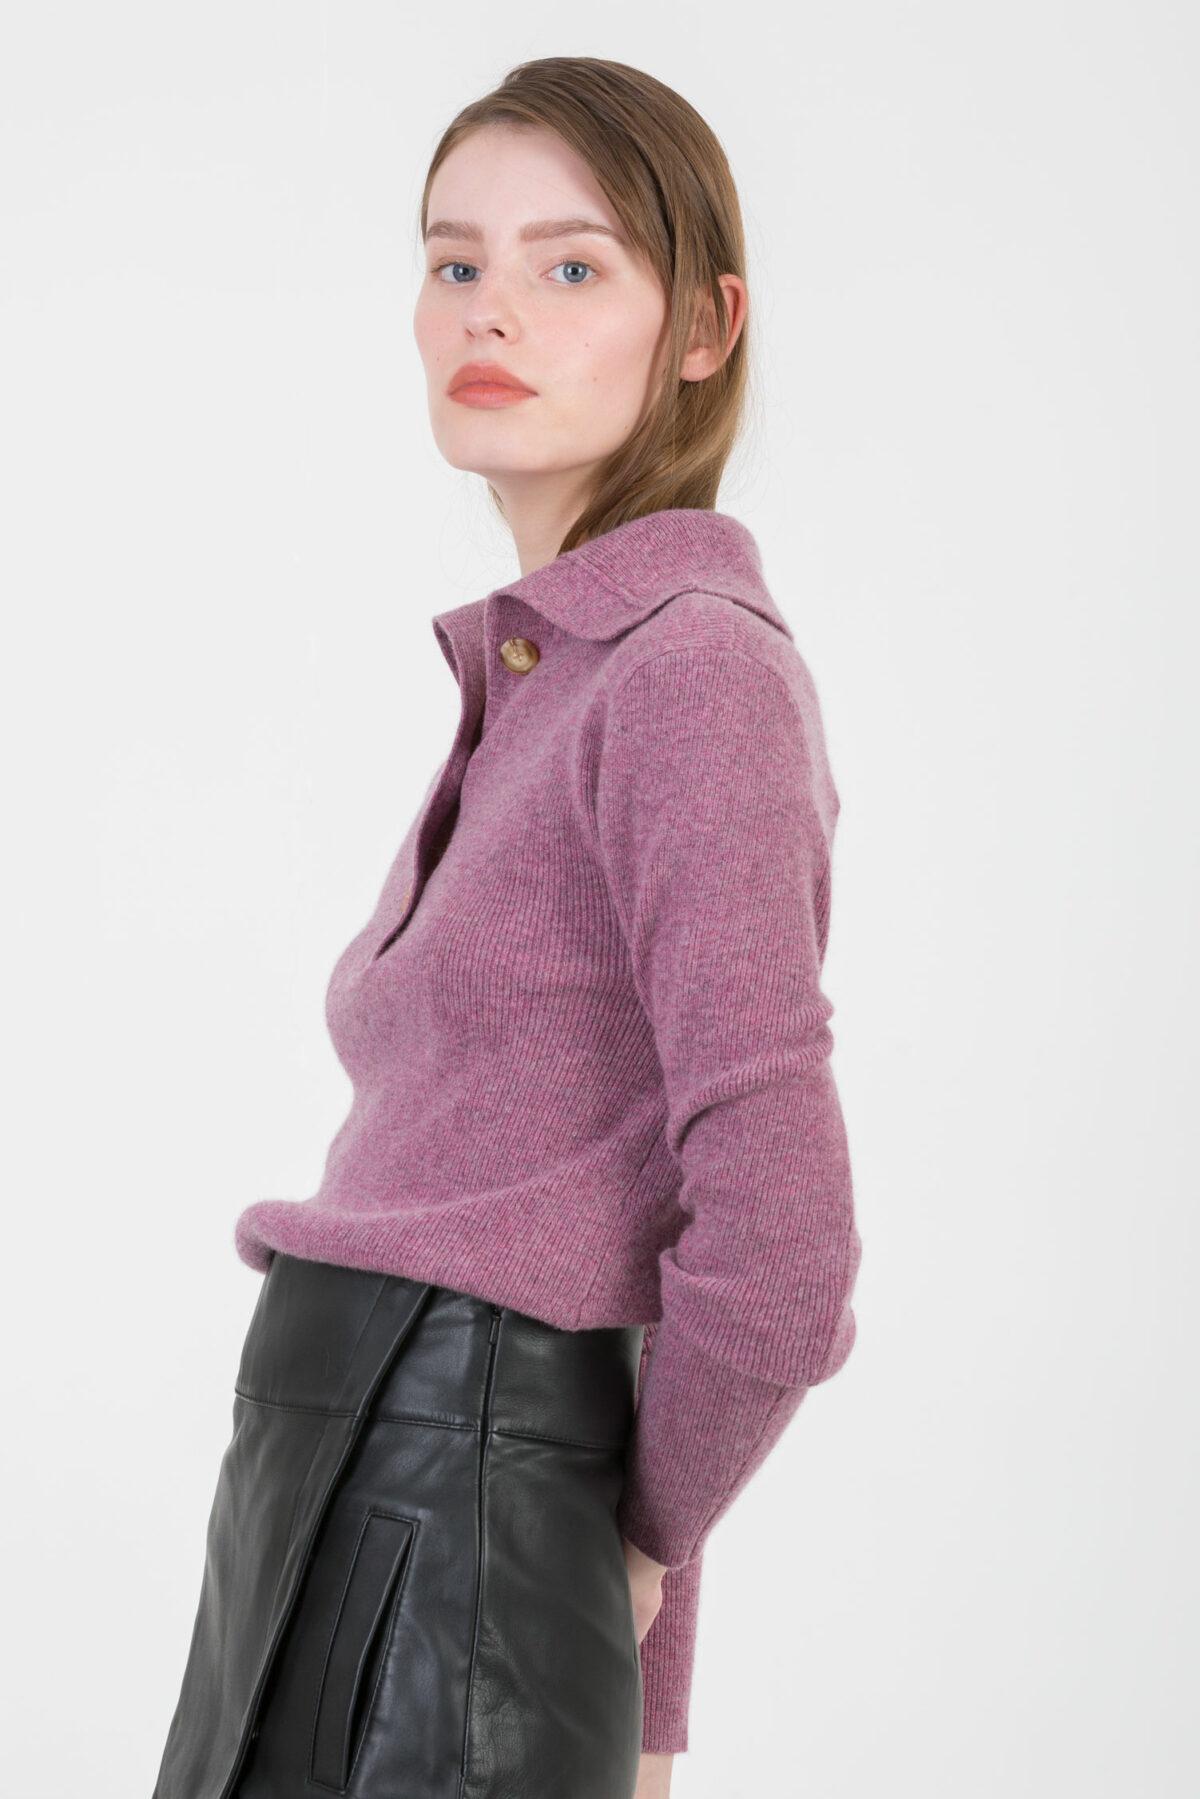 piper-bois-de-rose-lilac-sweater-wool-suncoo-matchboxathens